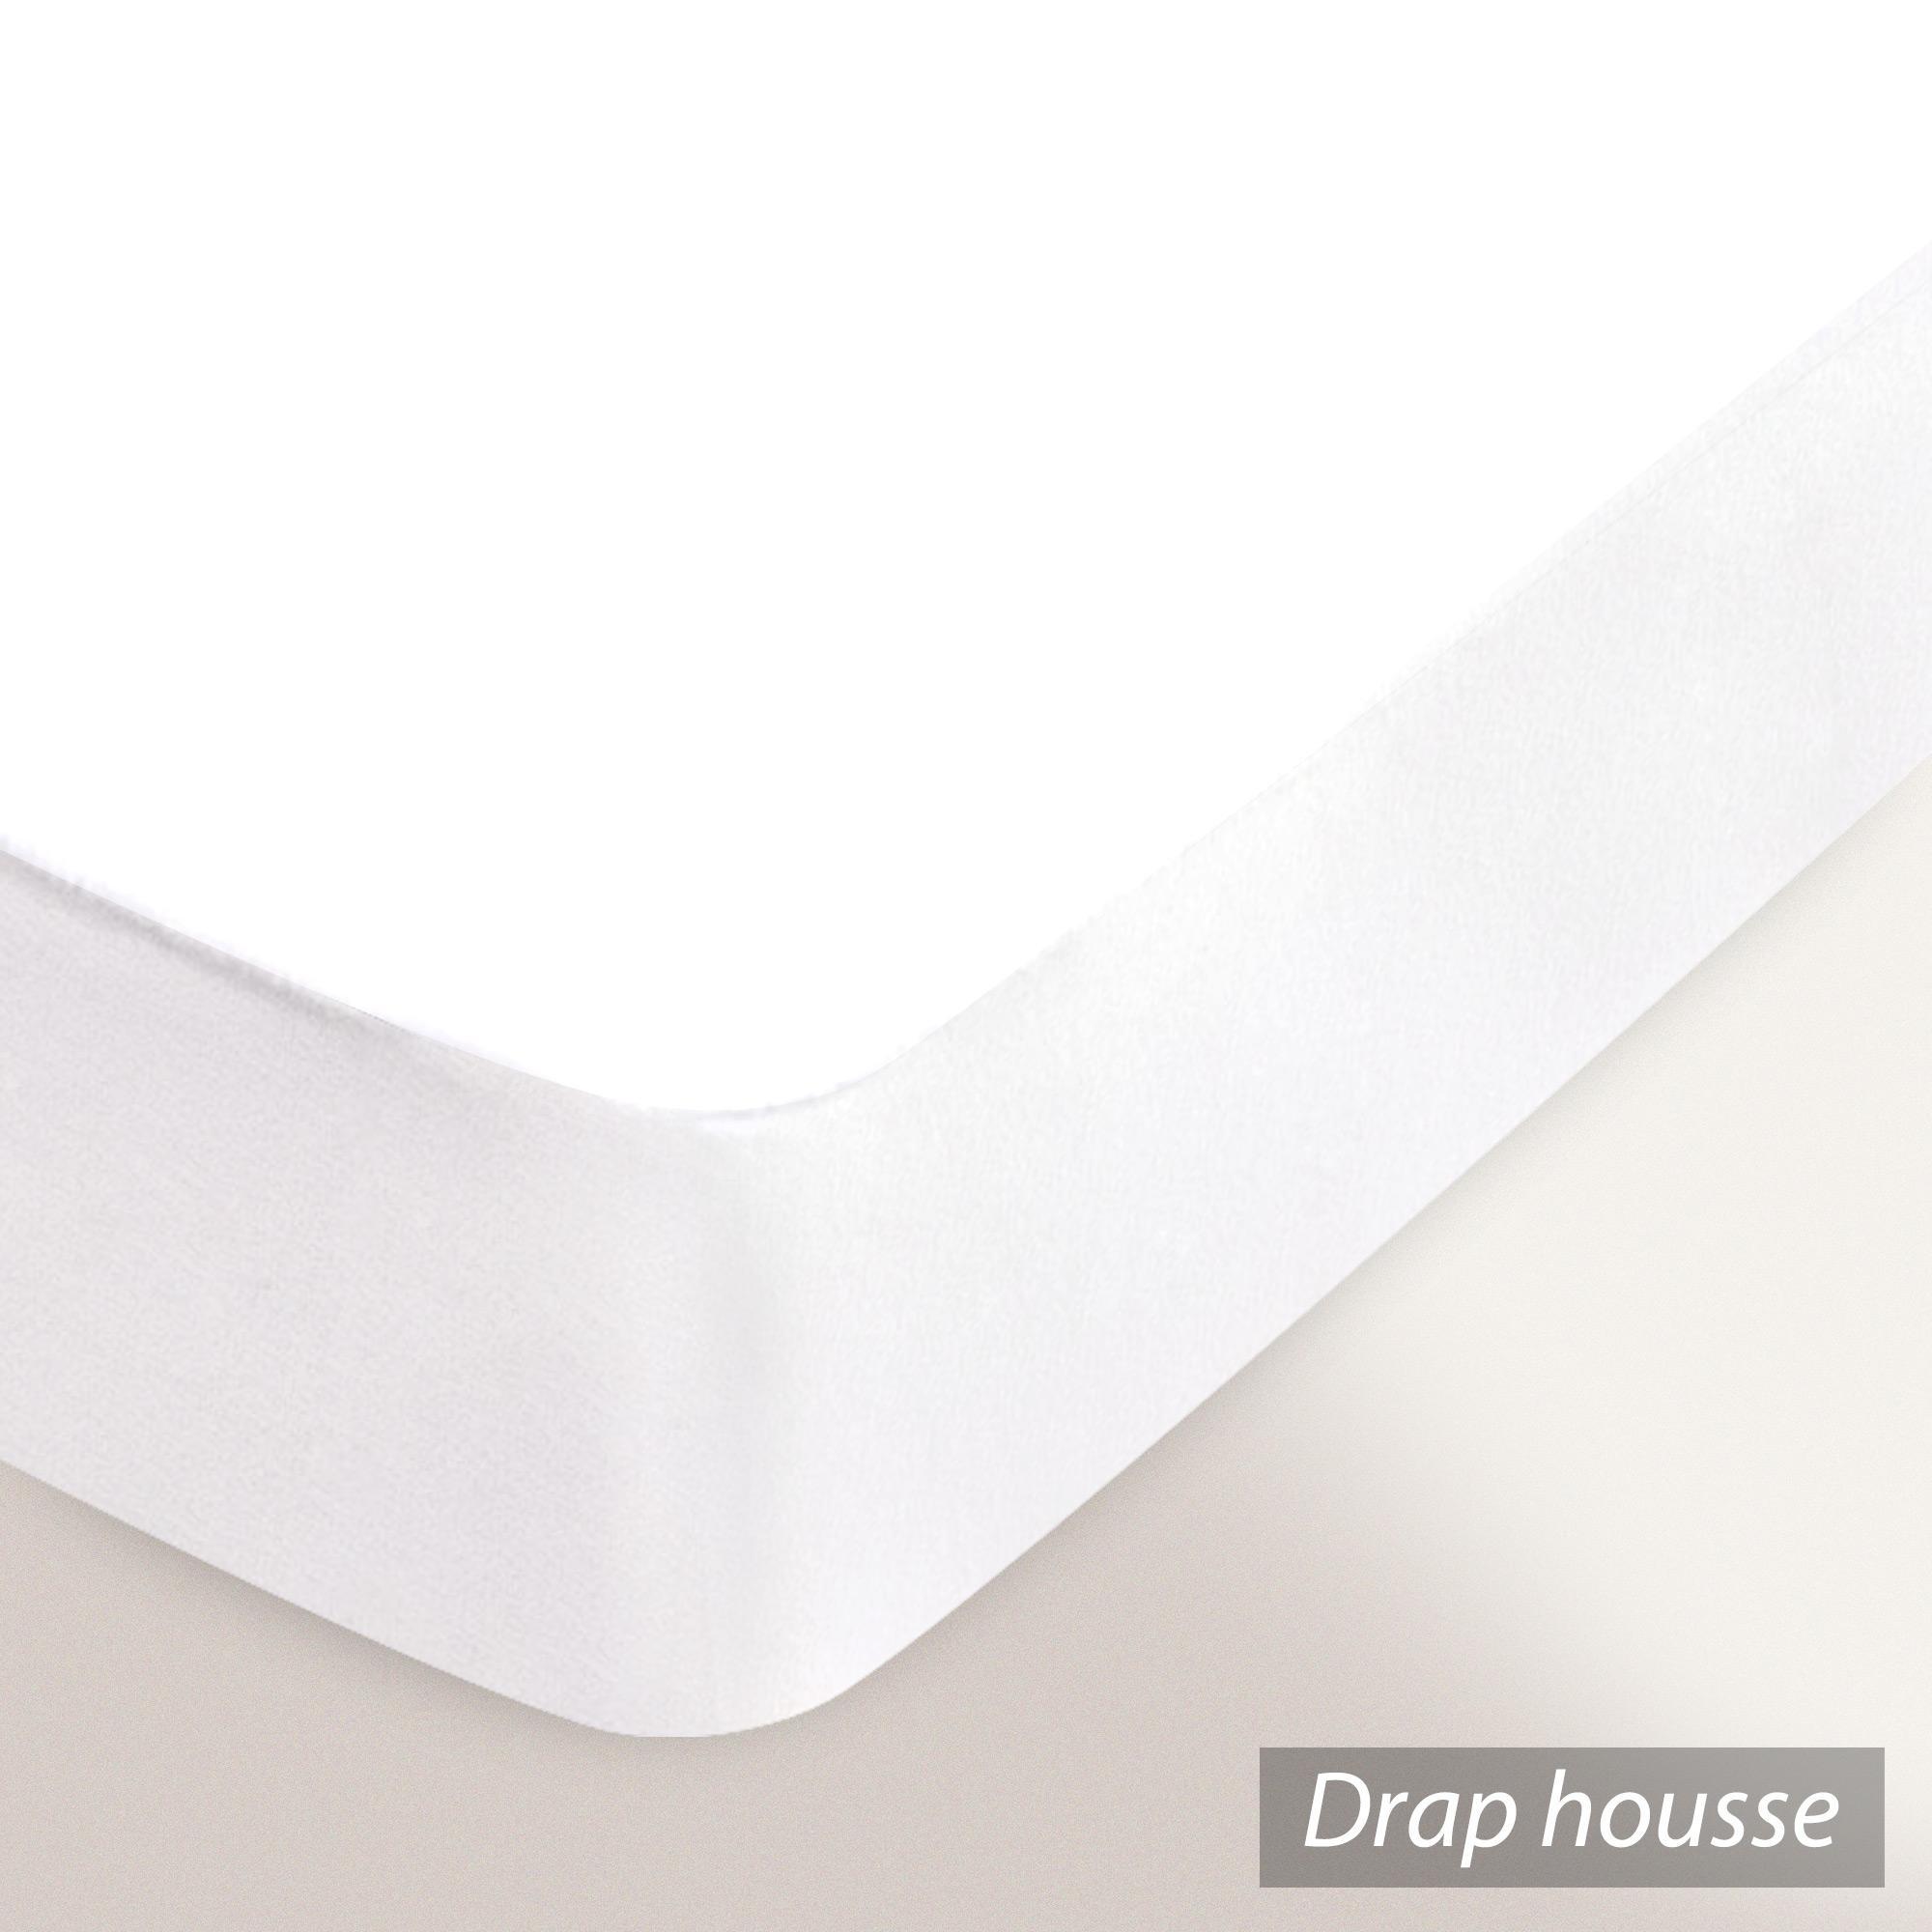 Protège matelas 90x200 cm ACHUA   Molleton 100% coton 400 g/m2